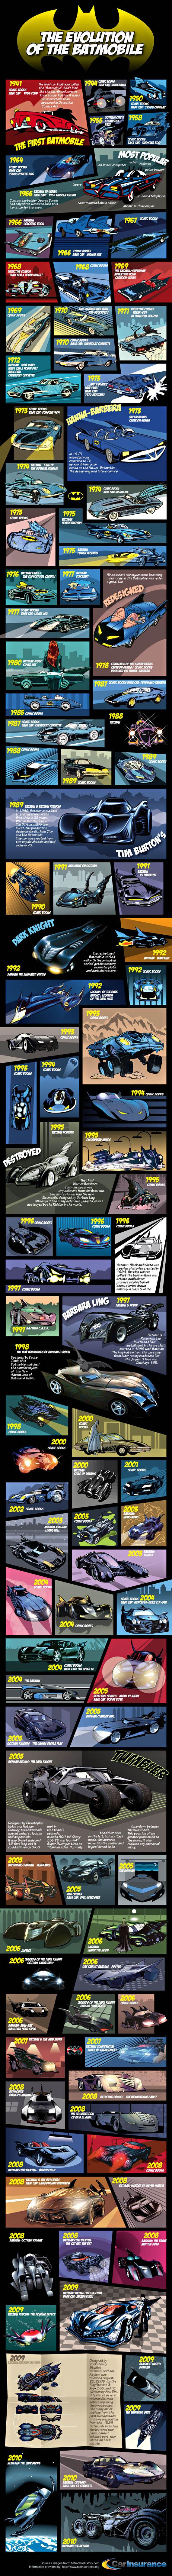 batmobile-through-the-ages